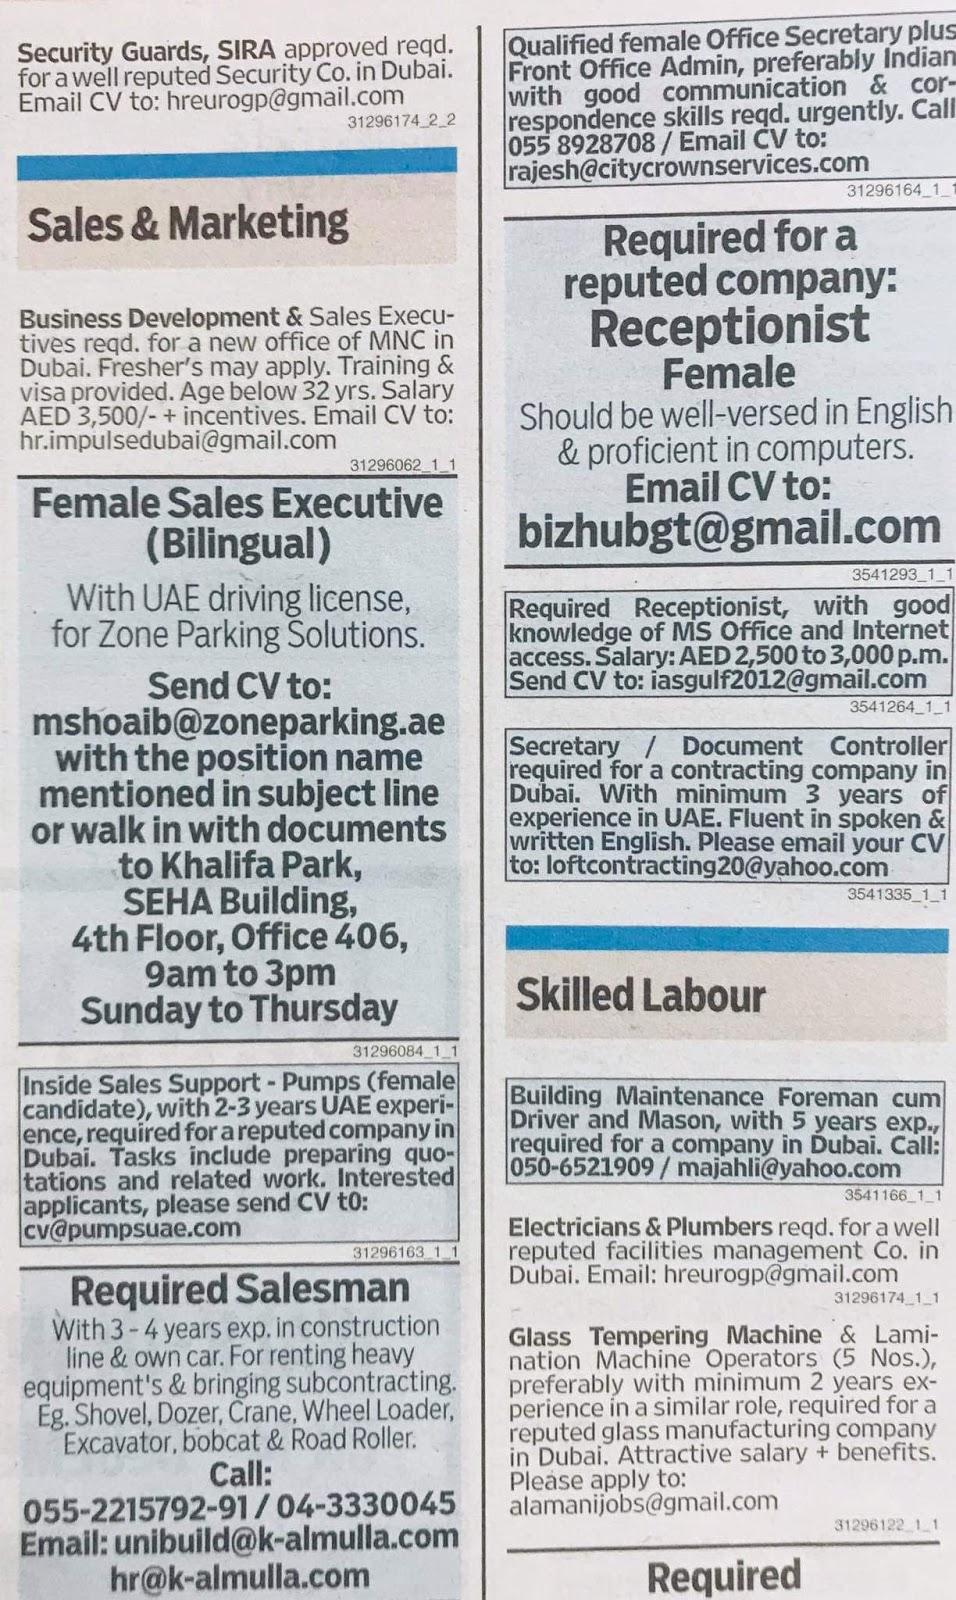 JOBS In UAE Local Hiring Khaleej Times-UAE-1512910- Jobs in